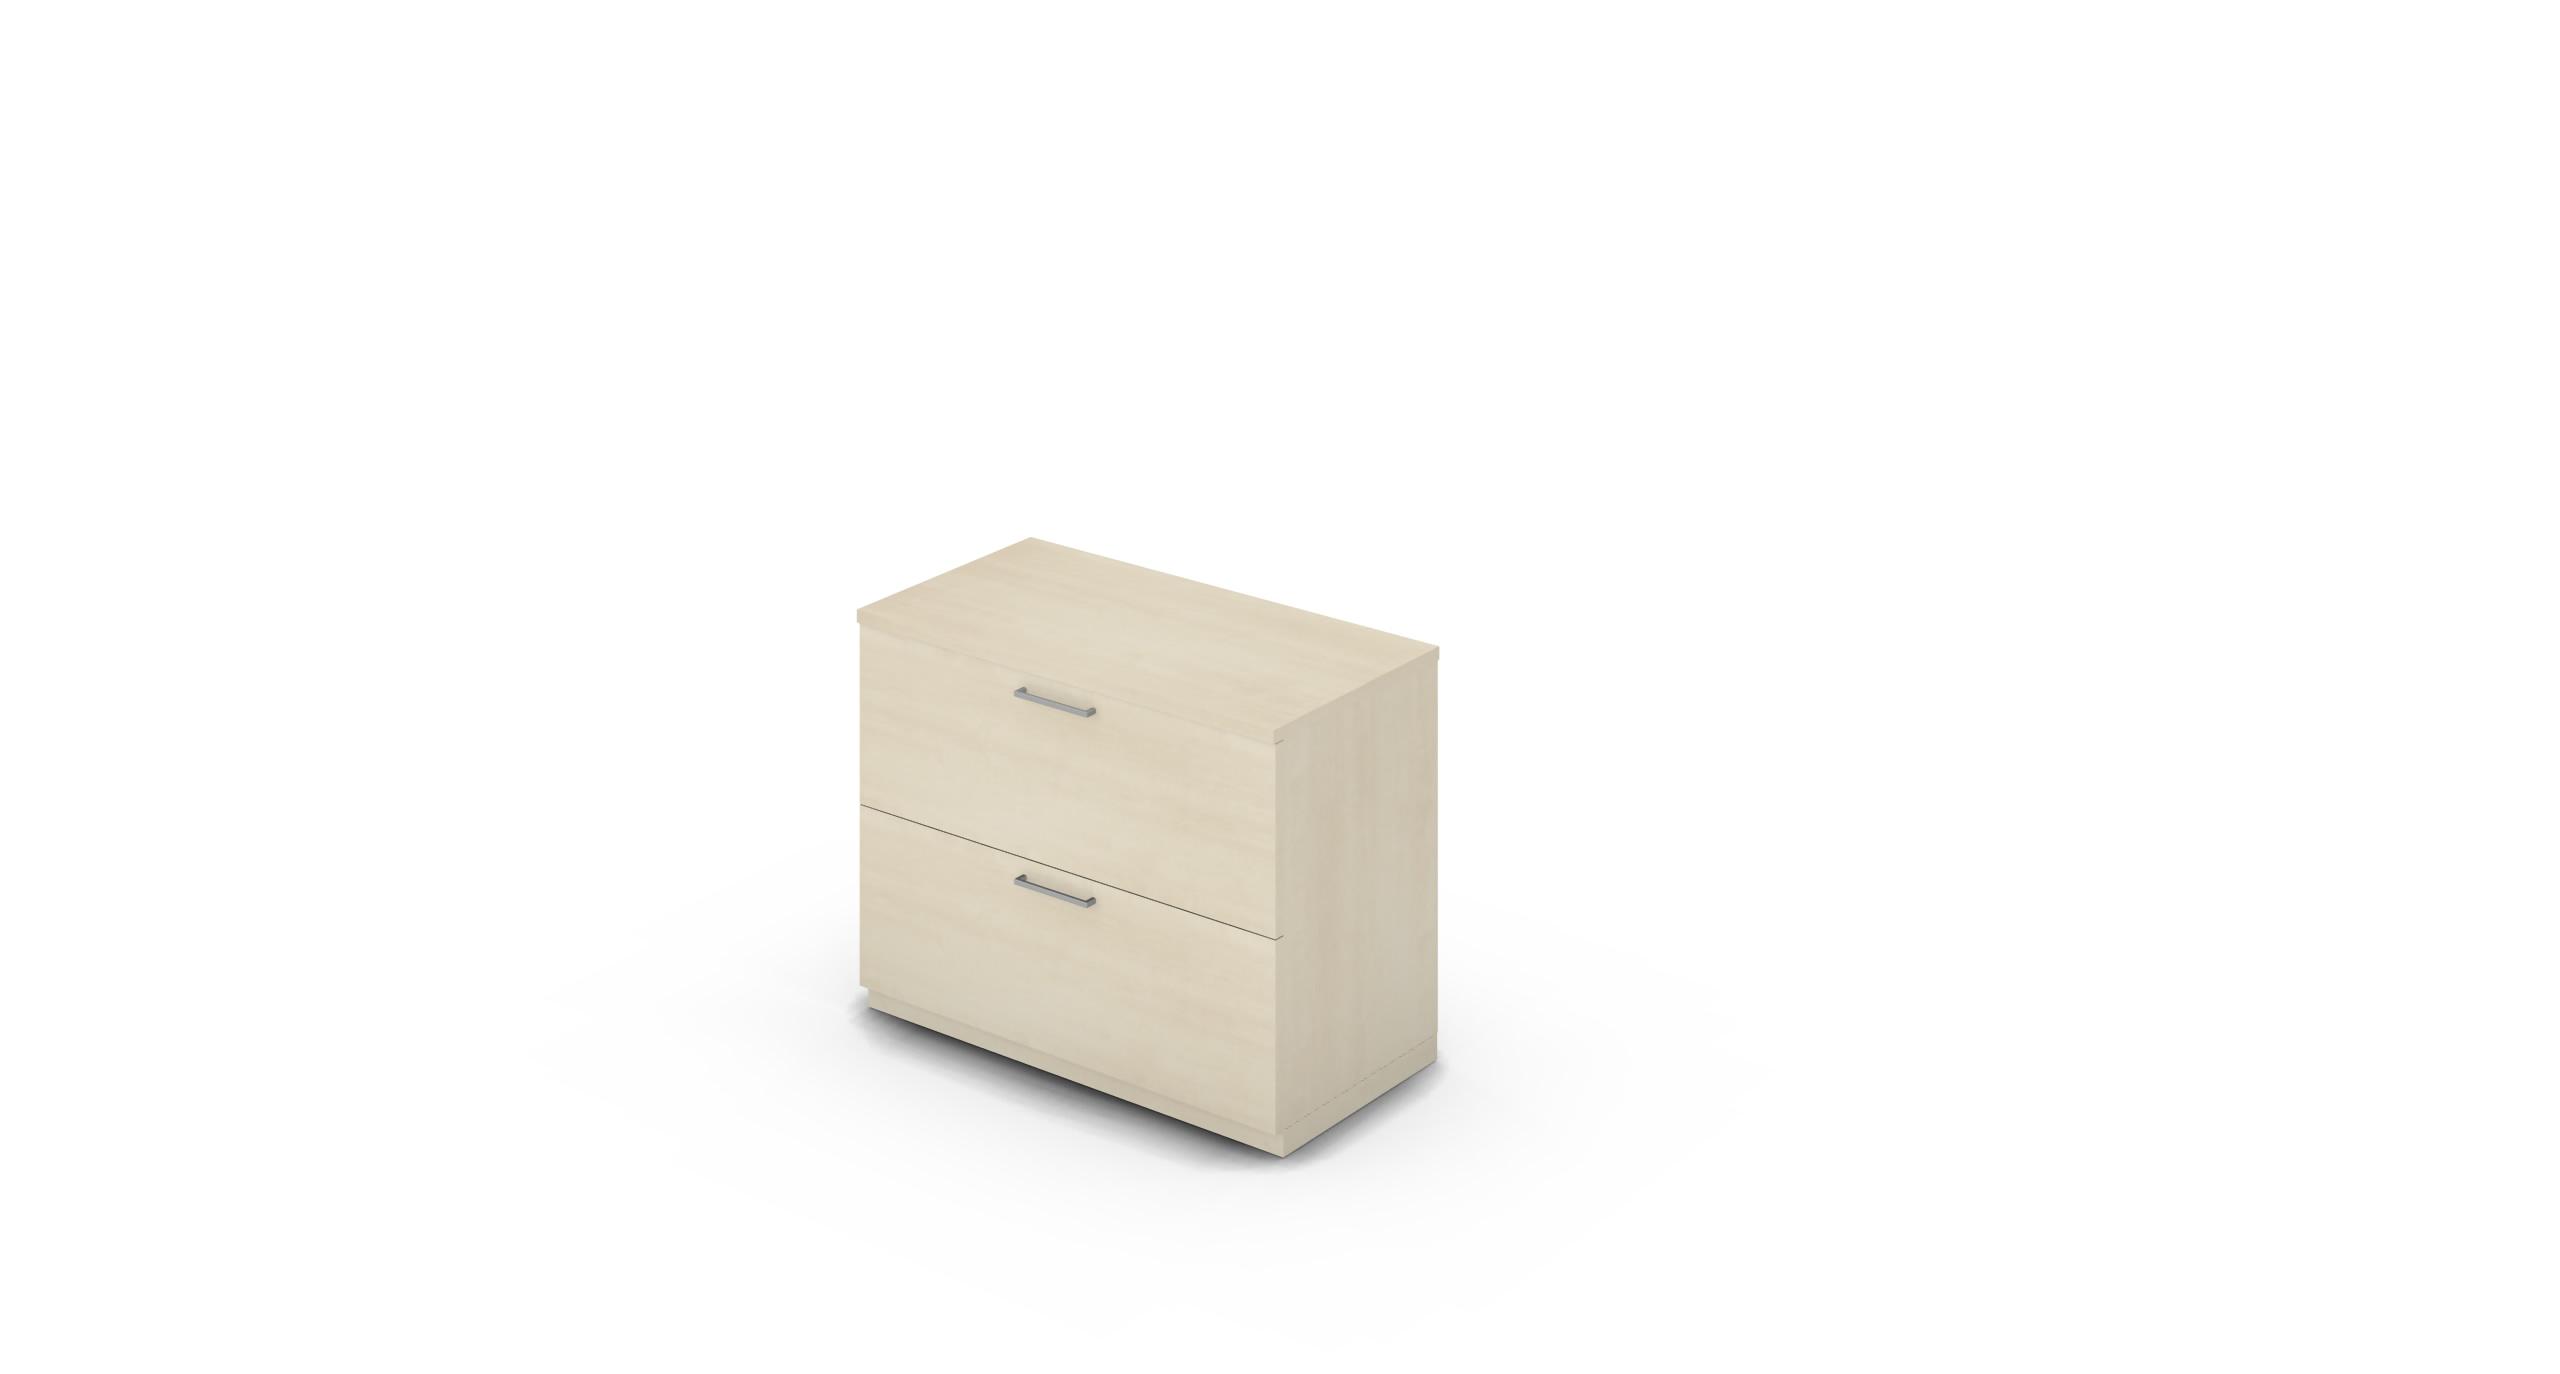 Cabinet_900x450x775_DR_Maple_Bar_Square_NoCylinder